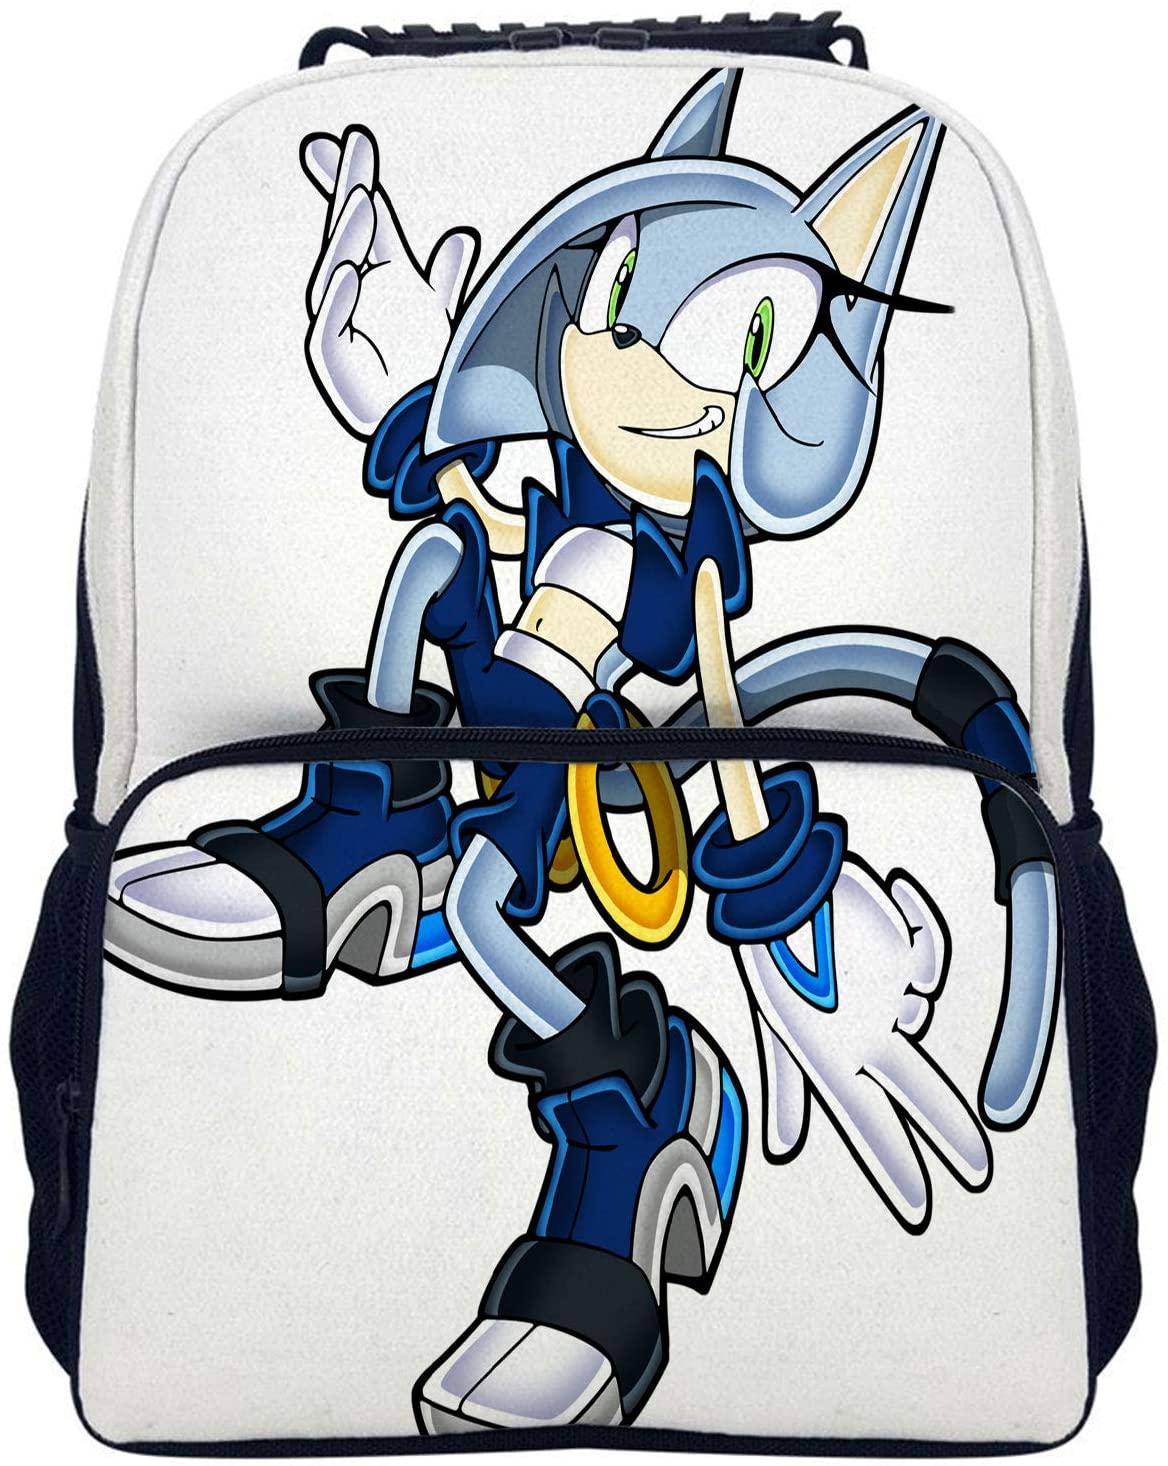 Sonic Backpack for Boys Teens Girls Boys Schoolbag